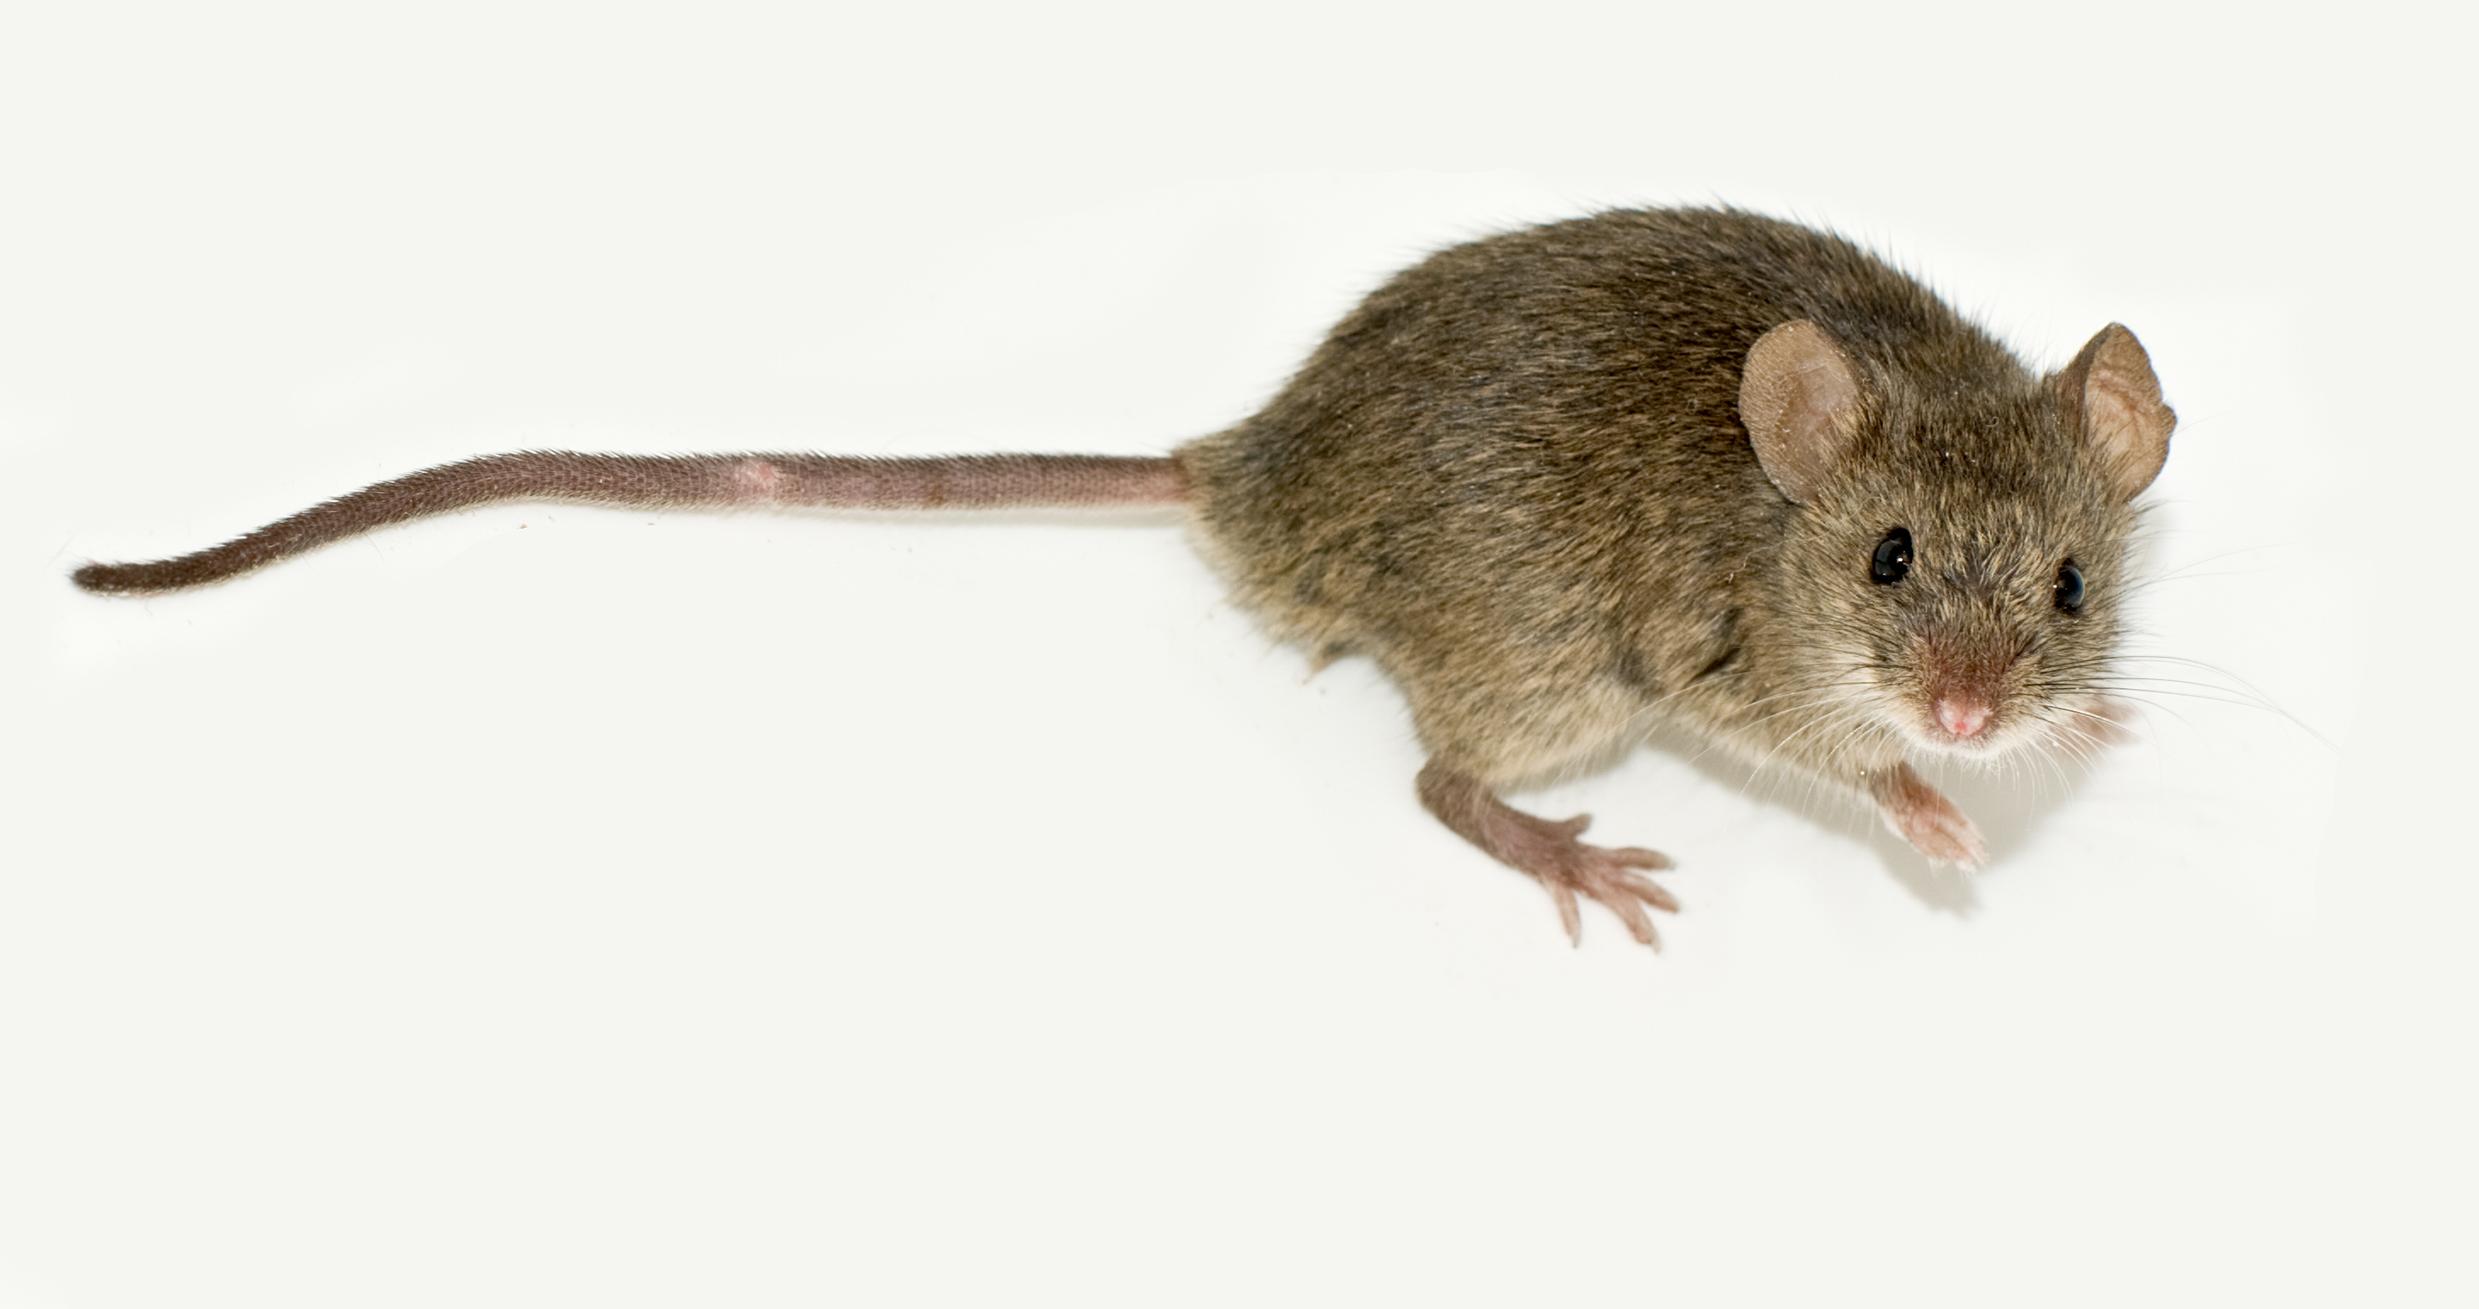 Rat Control Temecula Rat Control Hemet Rat Removal San